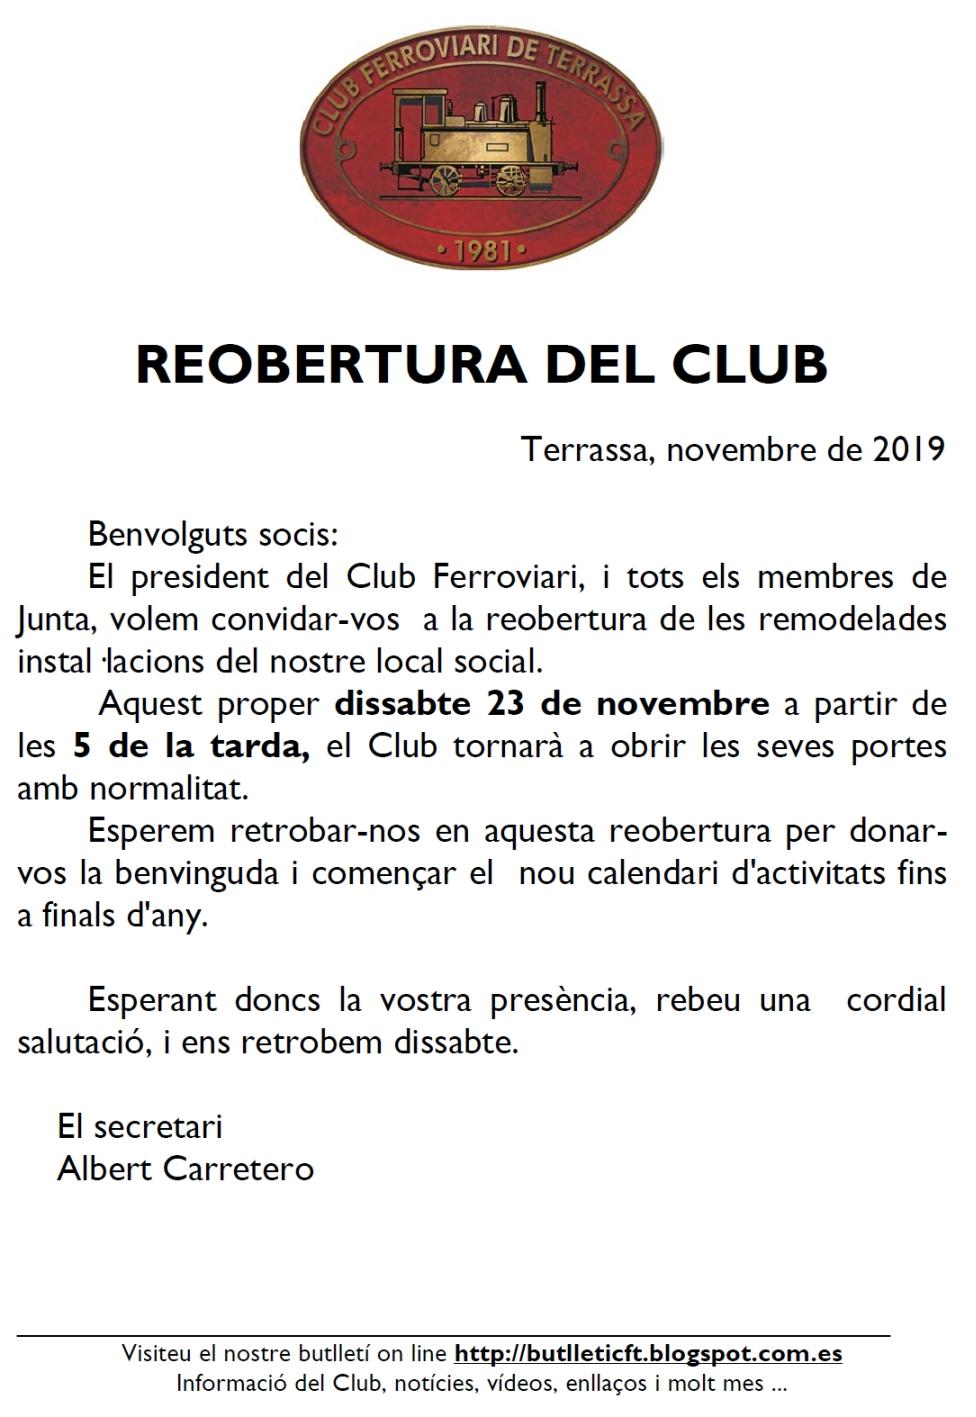 *** Reobertura del local del Club Ferroviari de Terrassa.